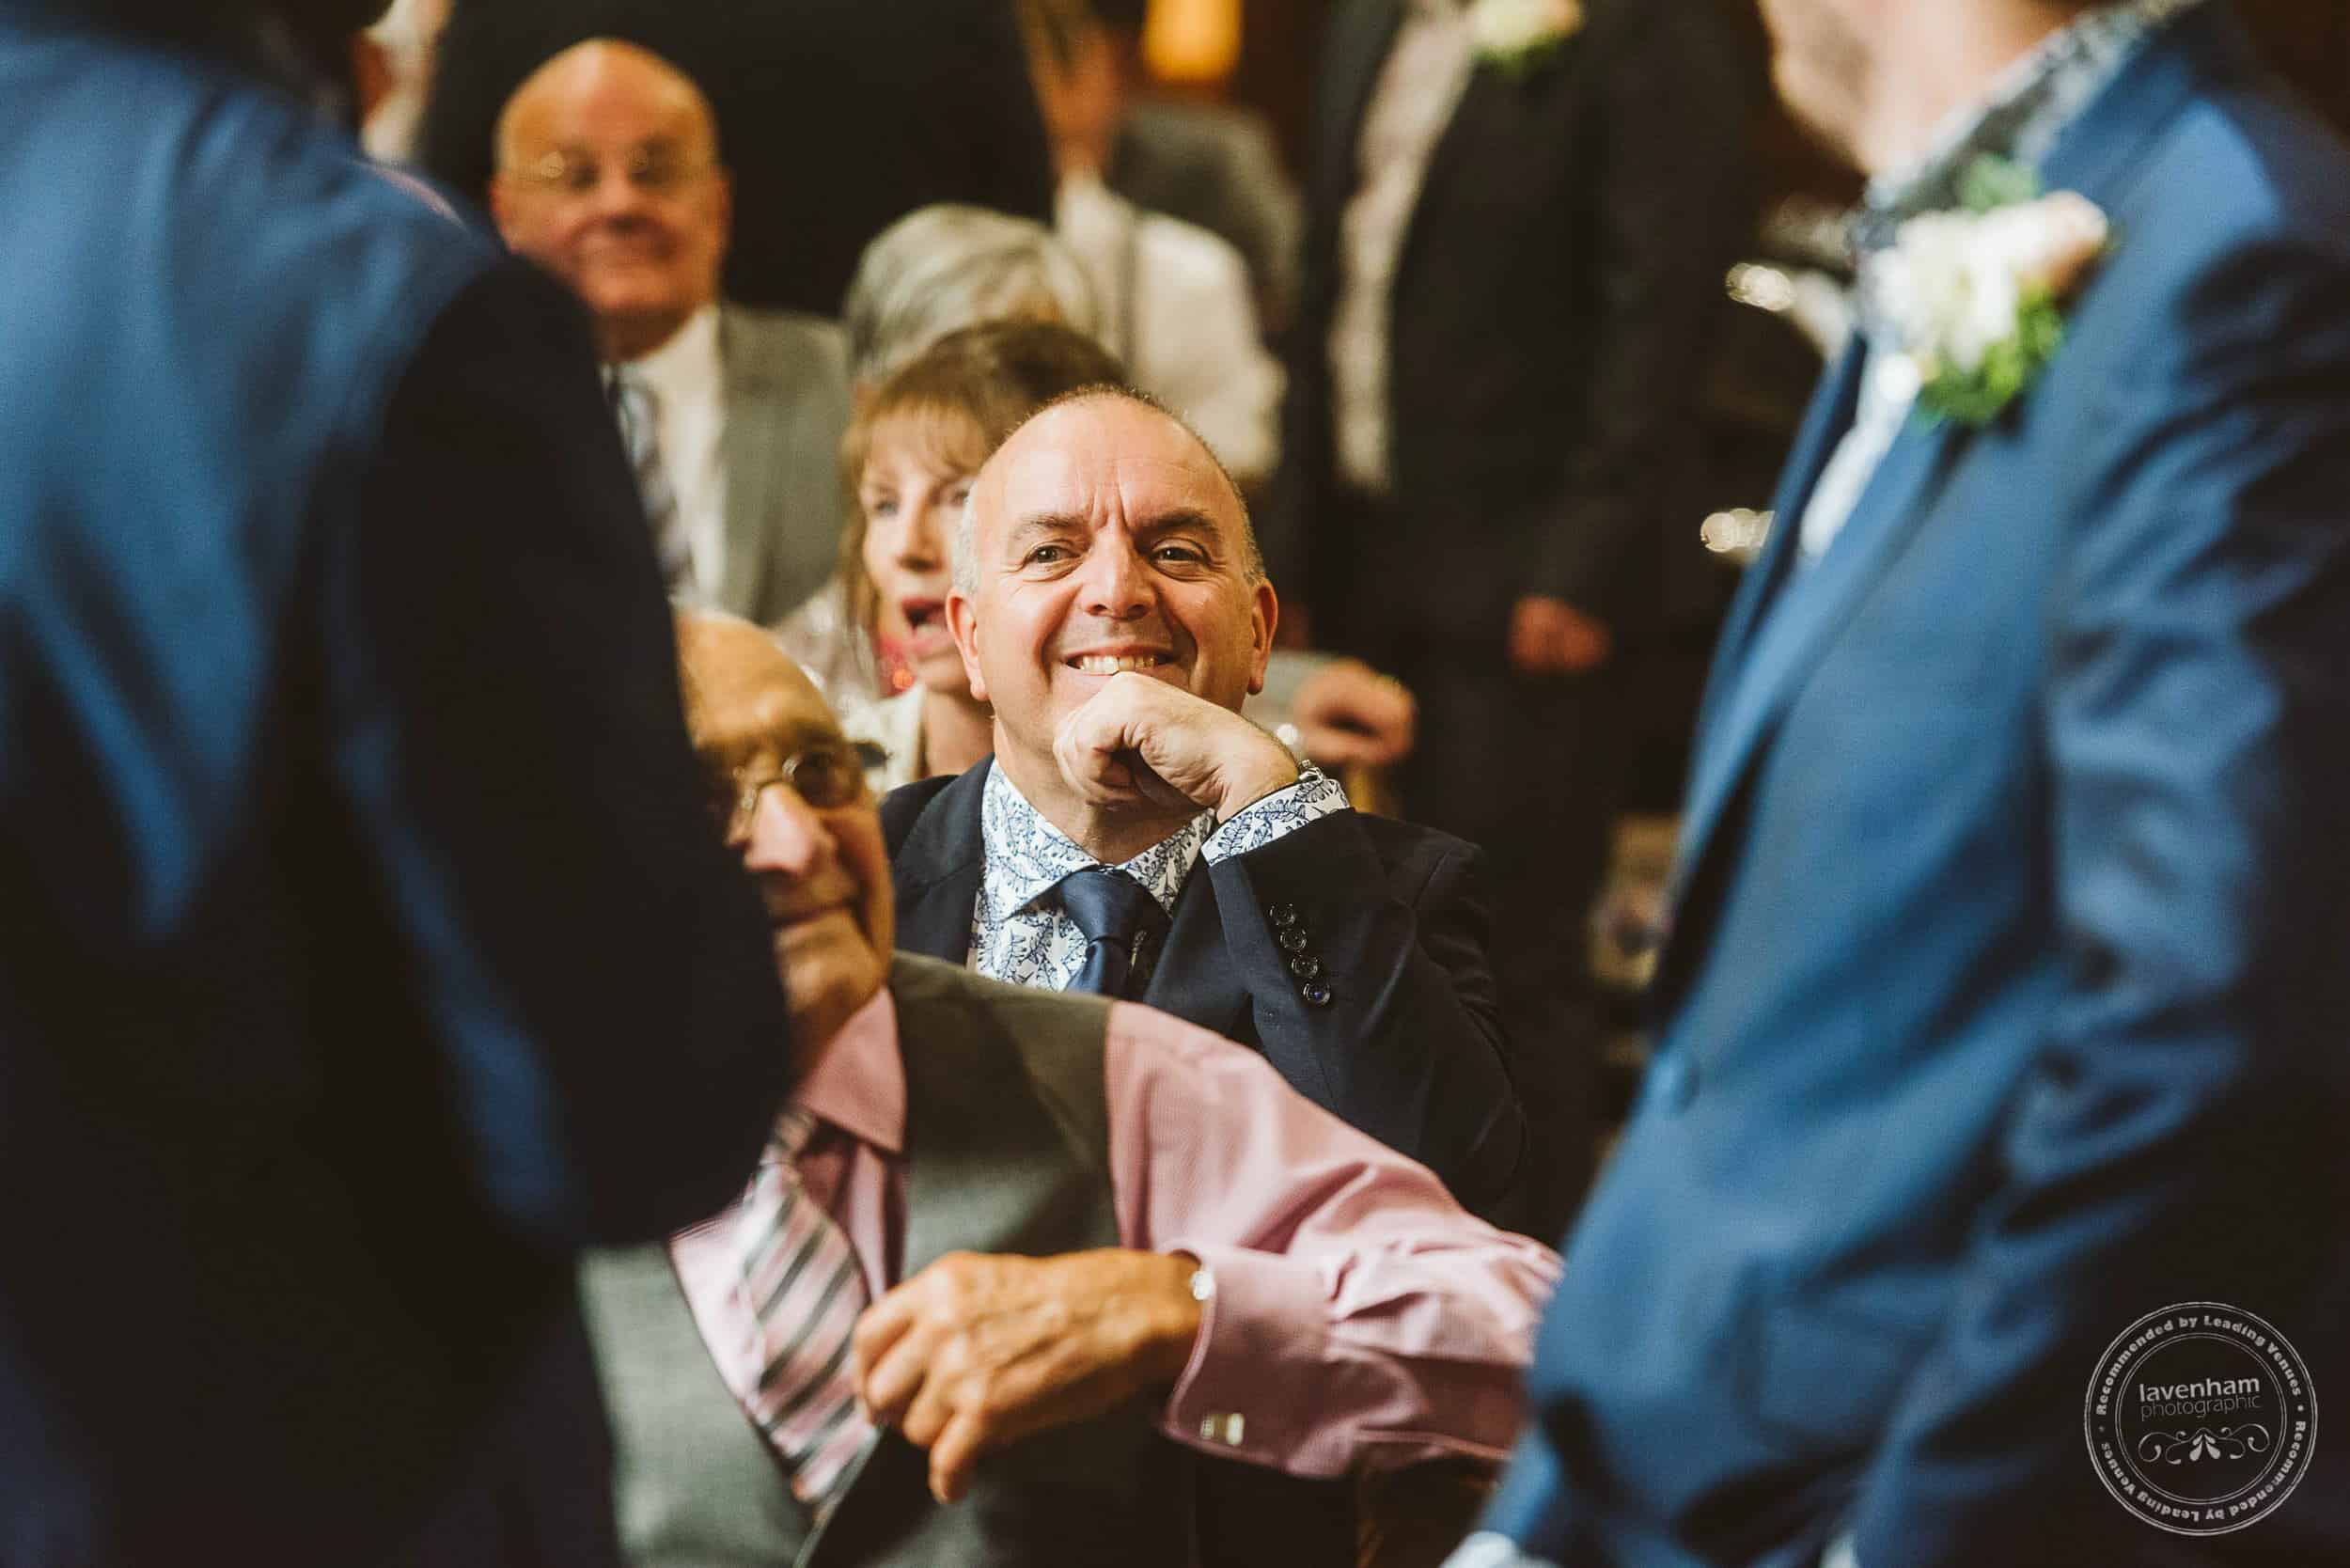 180818 Marks Hall Wedding Photography Lavenham Photographic 043